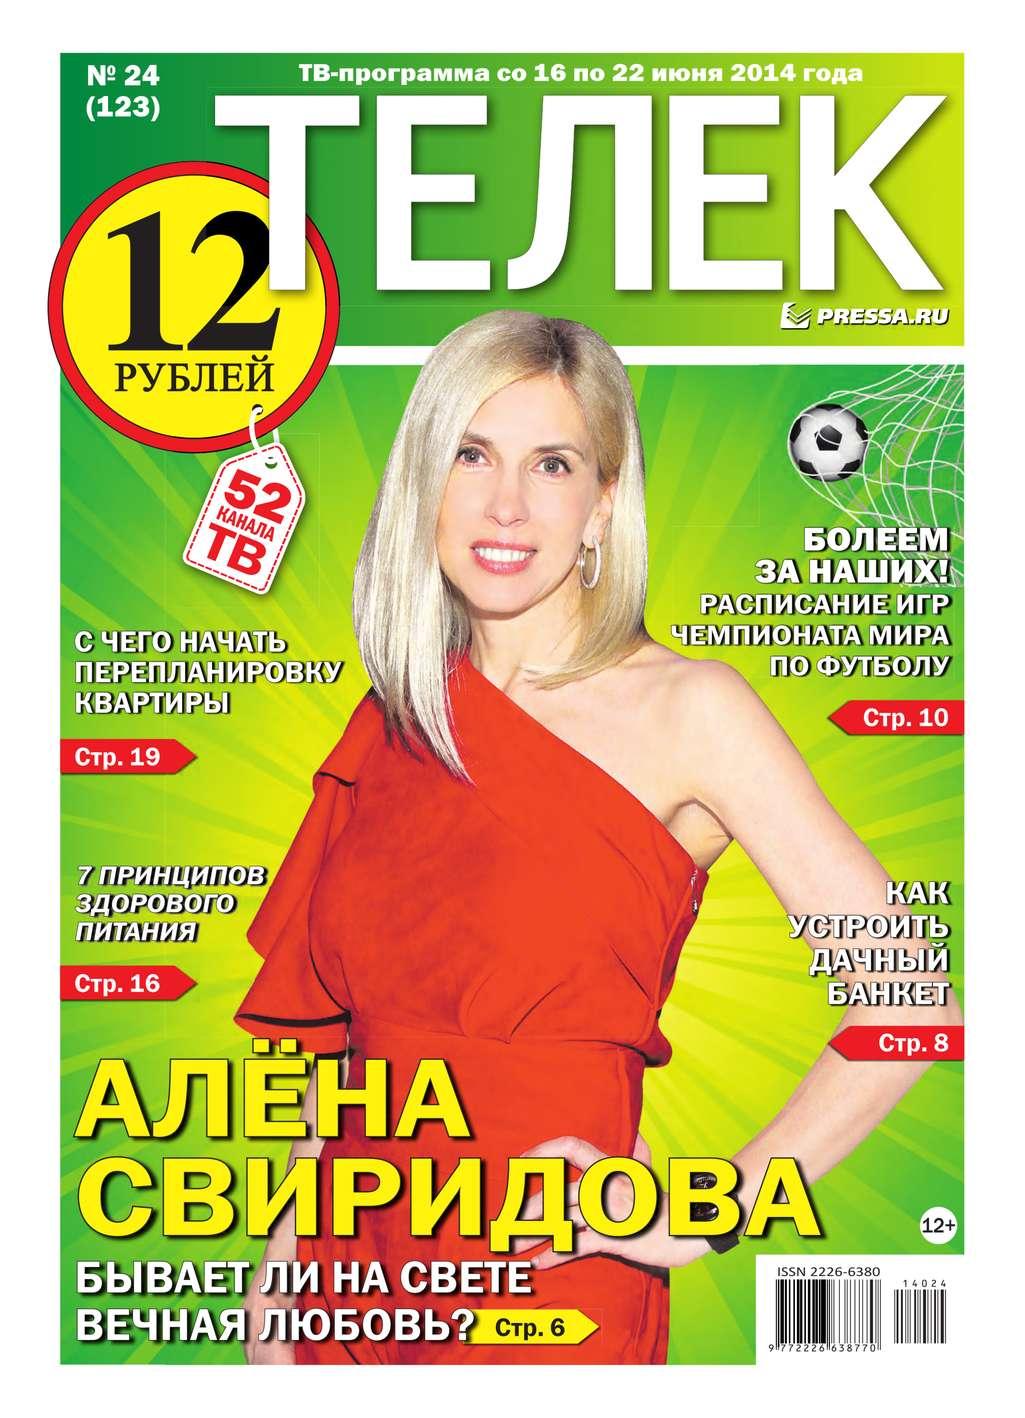 ТЕЛЕК PRESSA.RU 24-2014